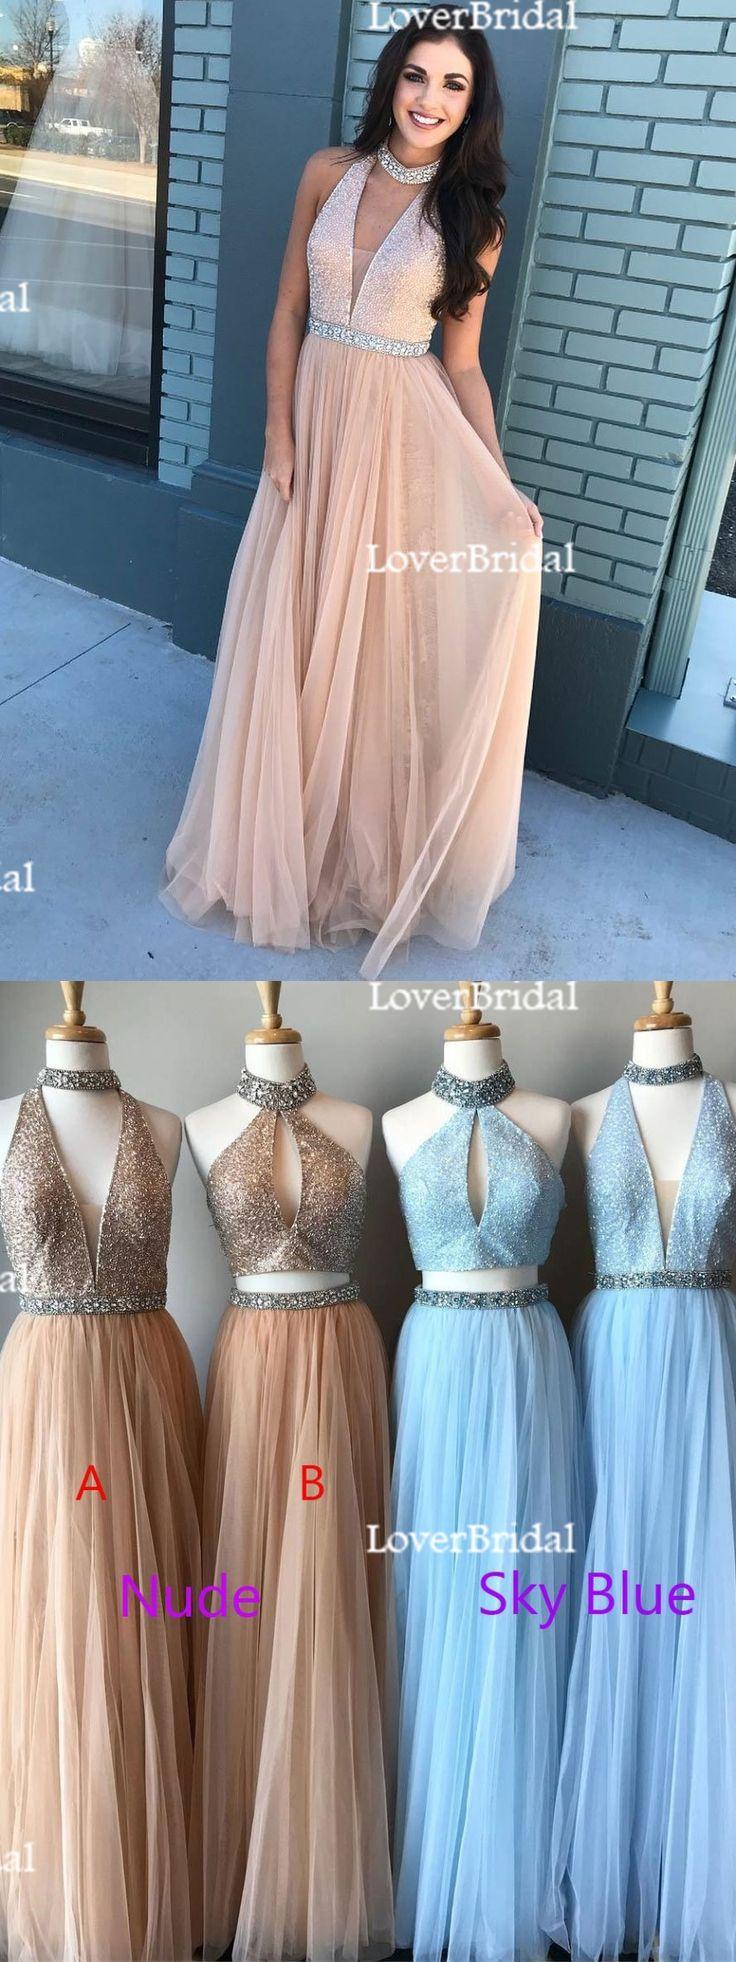 2018 Cheap Elegant Fashion Sexy Halter Tulle Beaded Custom Long Evening Prom Dresses, 17358